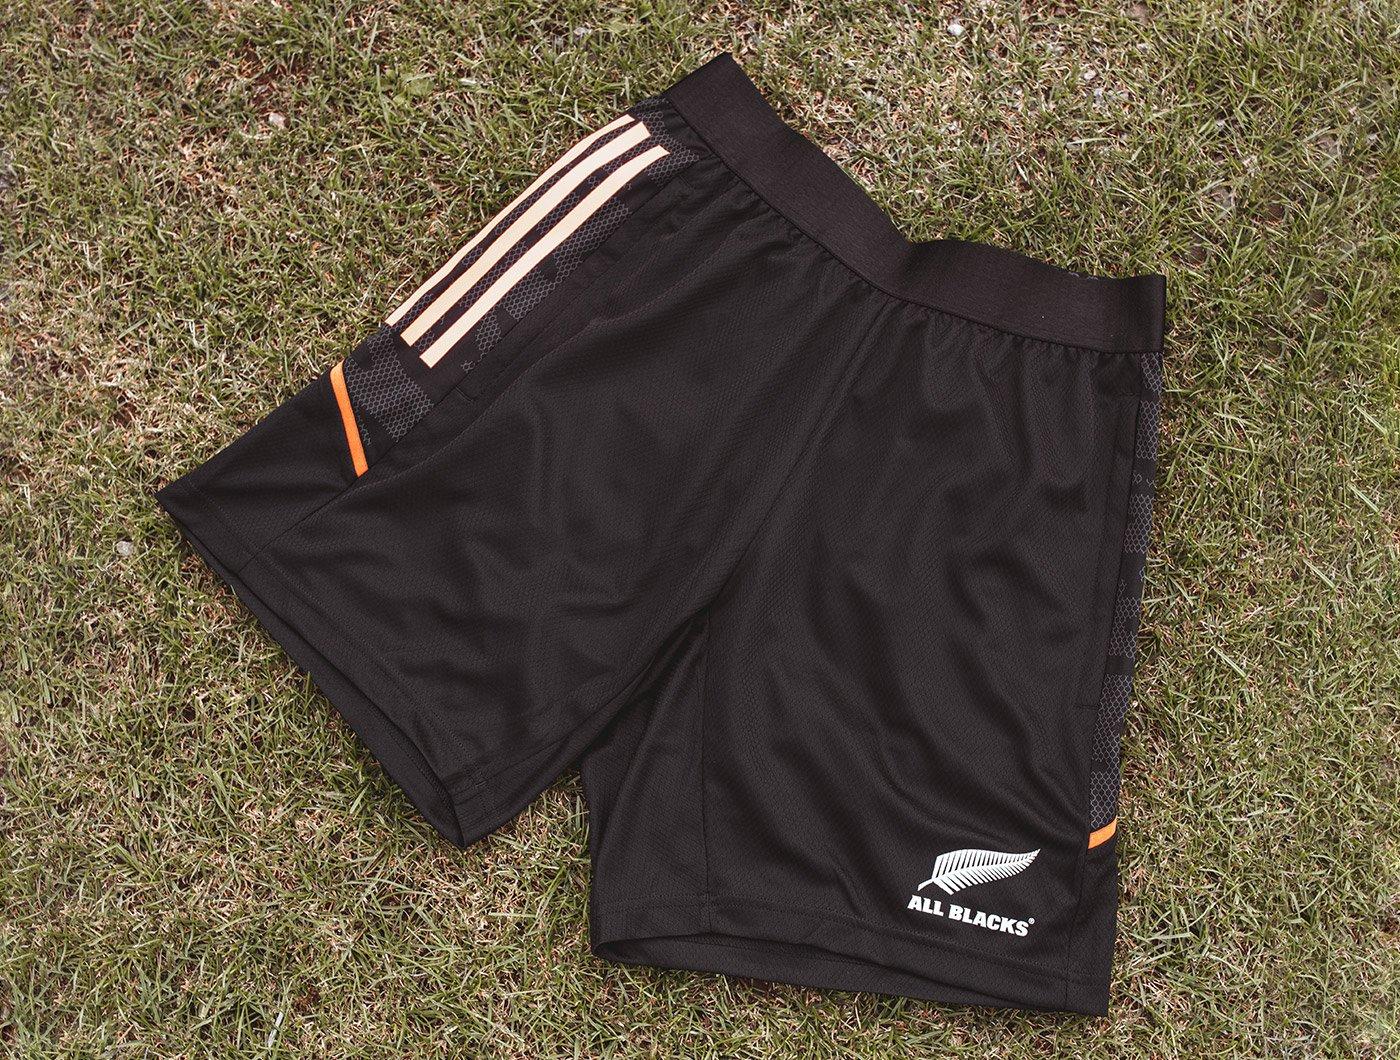 Black Optimum Sports Fiji Rugby Shorts For High Level Performance Training